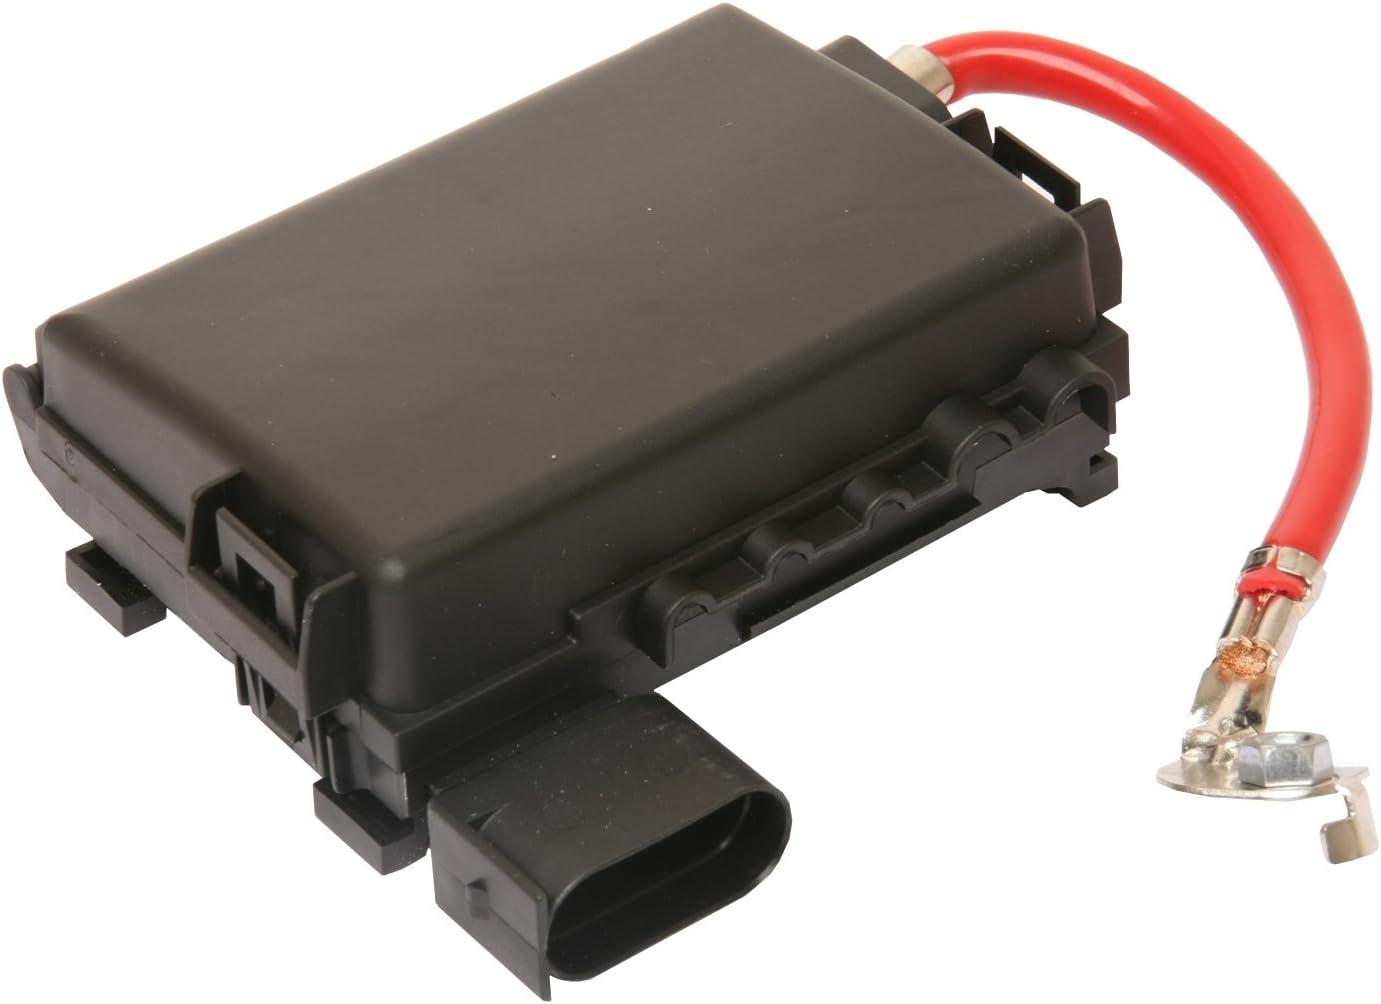 Brand New Fuse Box W// Wiring Harness Plug For Volkswagen OEM # 1J0-937-617D